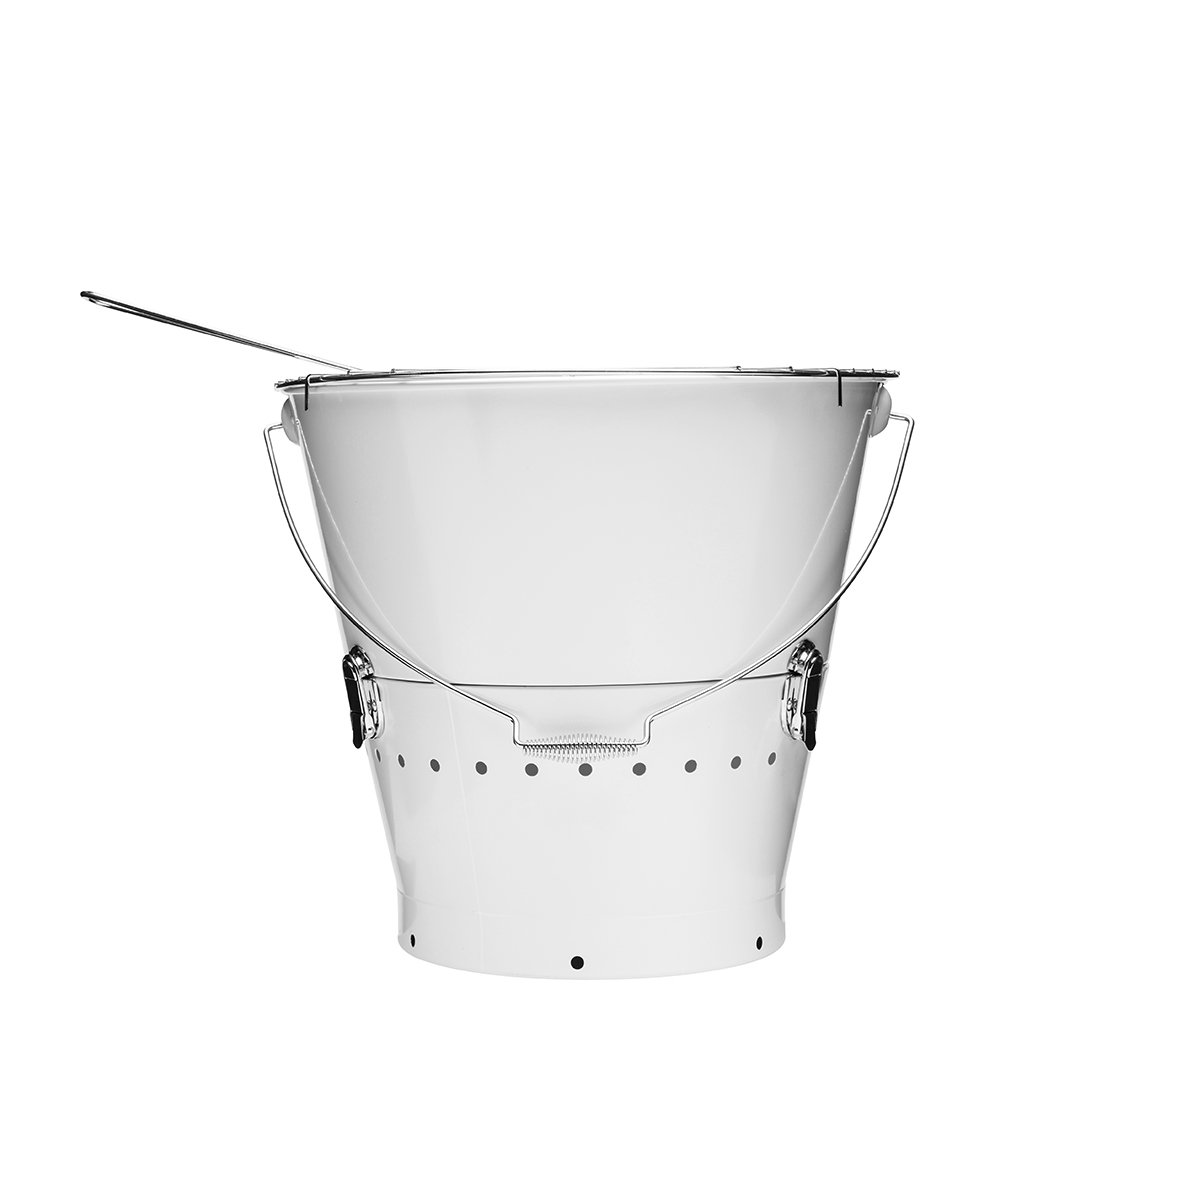 Sagaform 5016670 - BBQ Grilleimer, weiß - (Ø x H): 38 x 37 cm